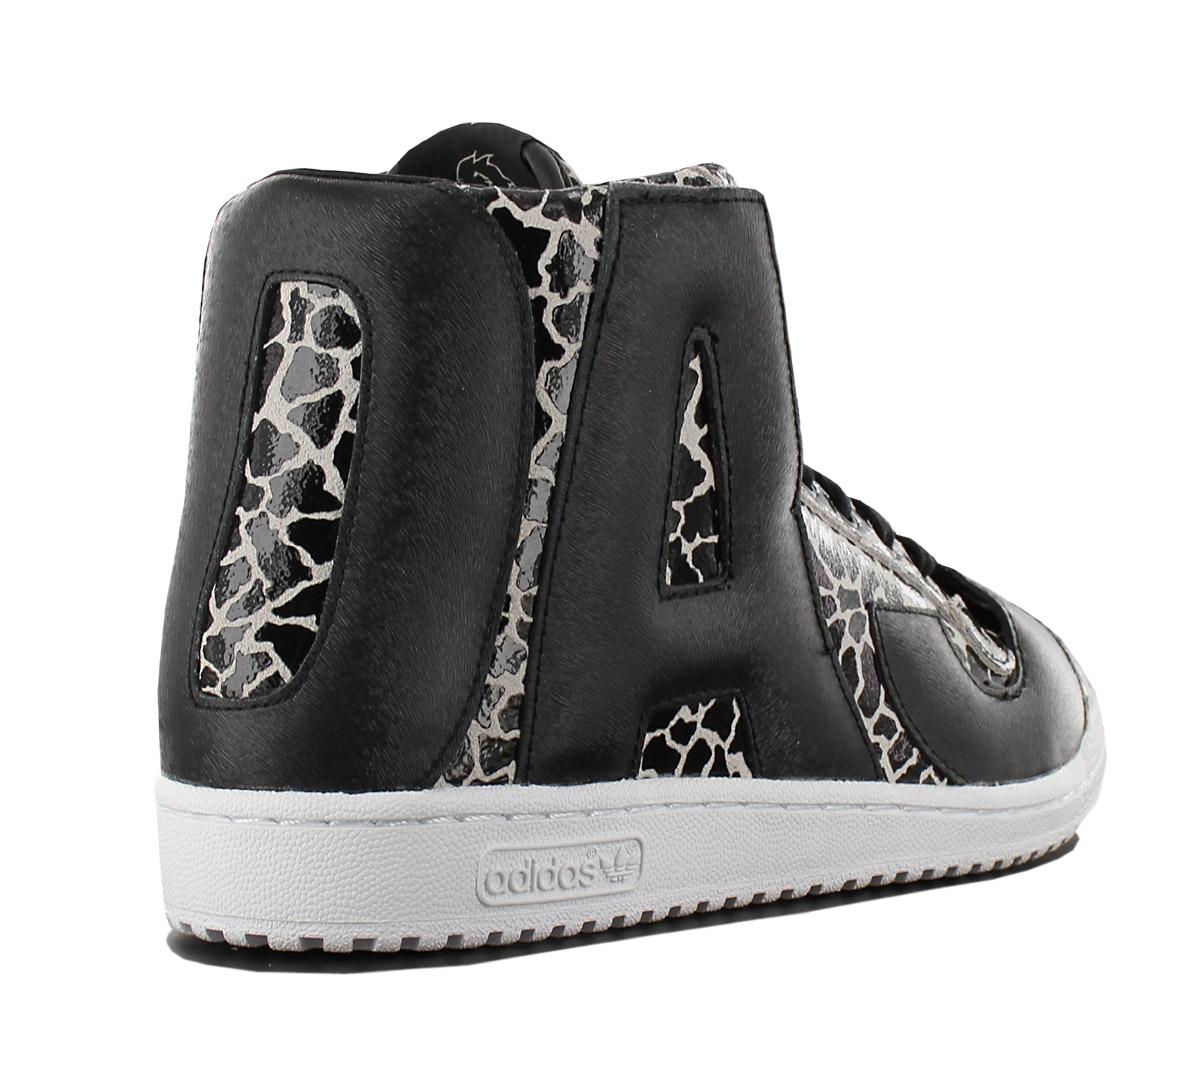 promo code 1fd8e caeb1 Adidas Originals Jeremy Scott Js Letters Giraffe Men s Sneakers ...